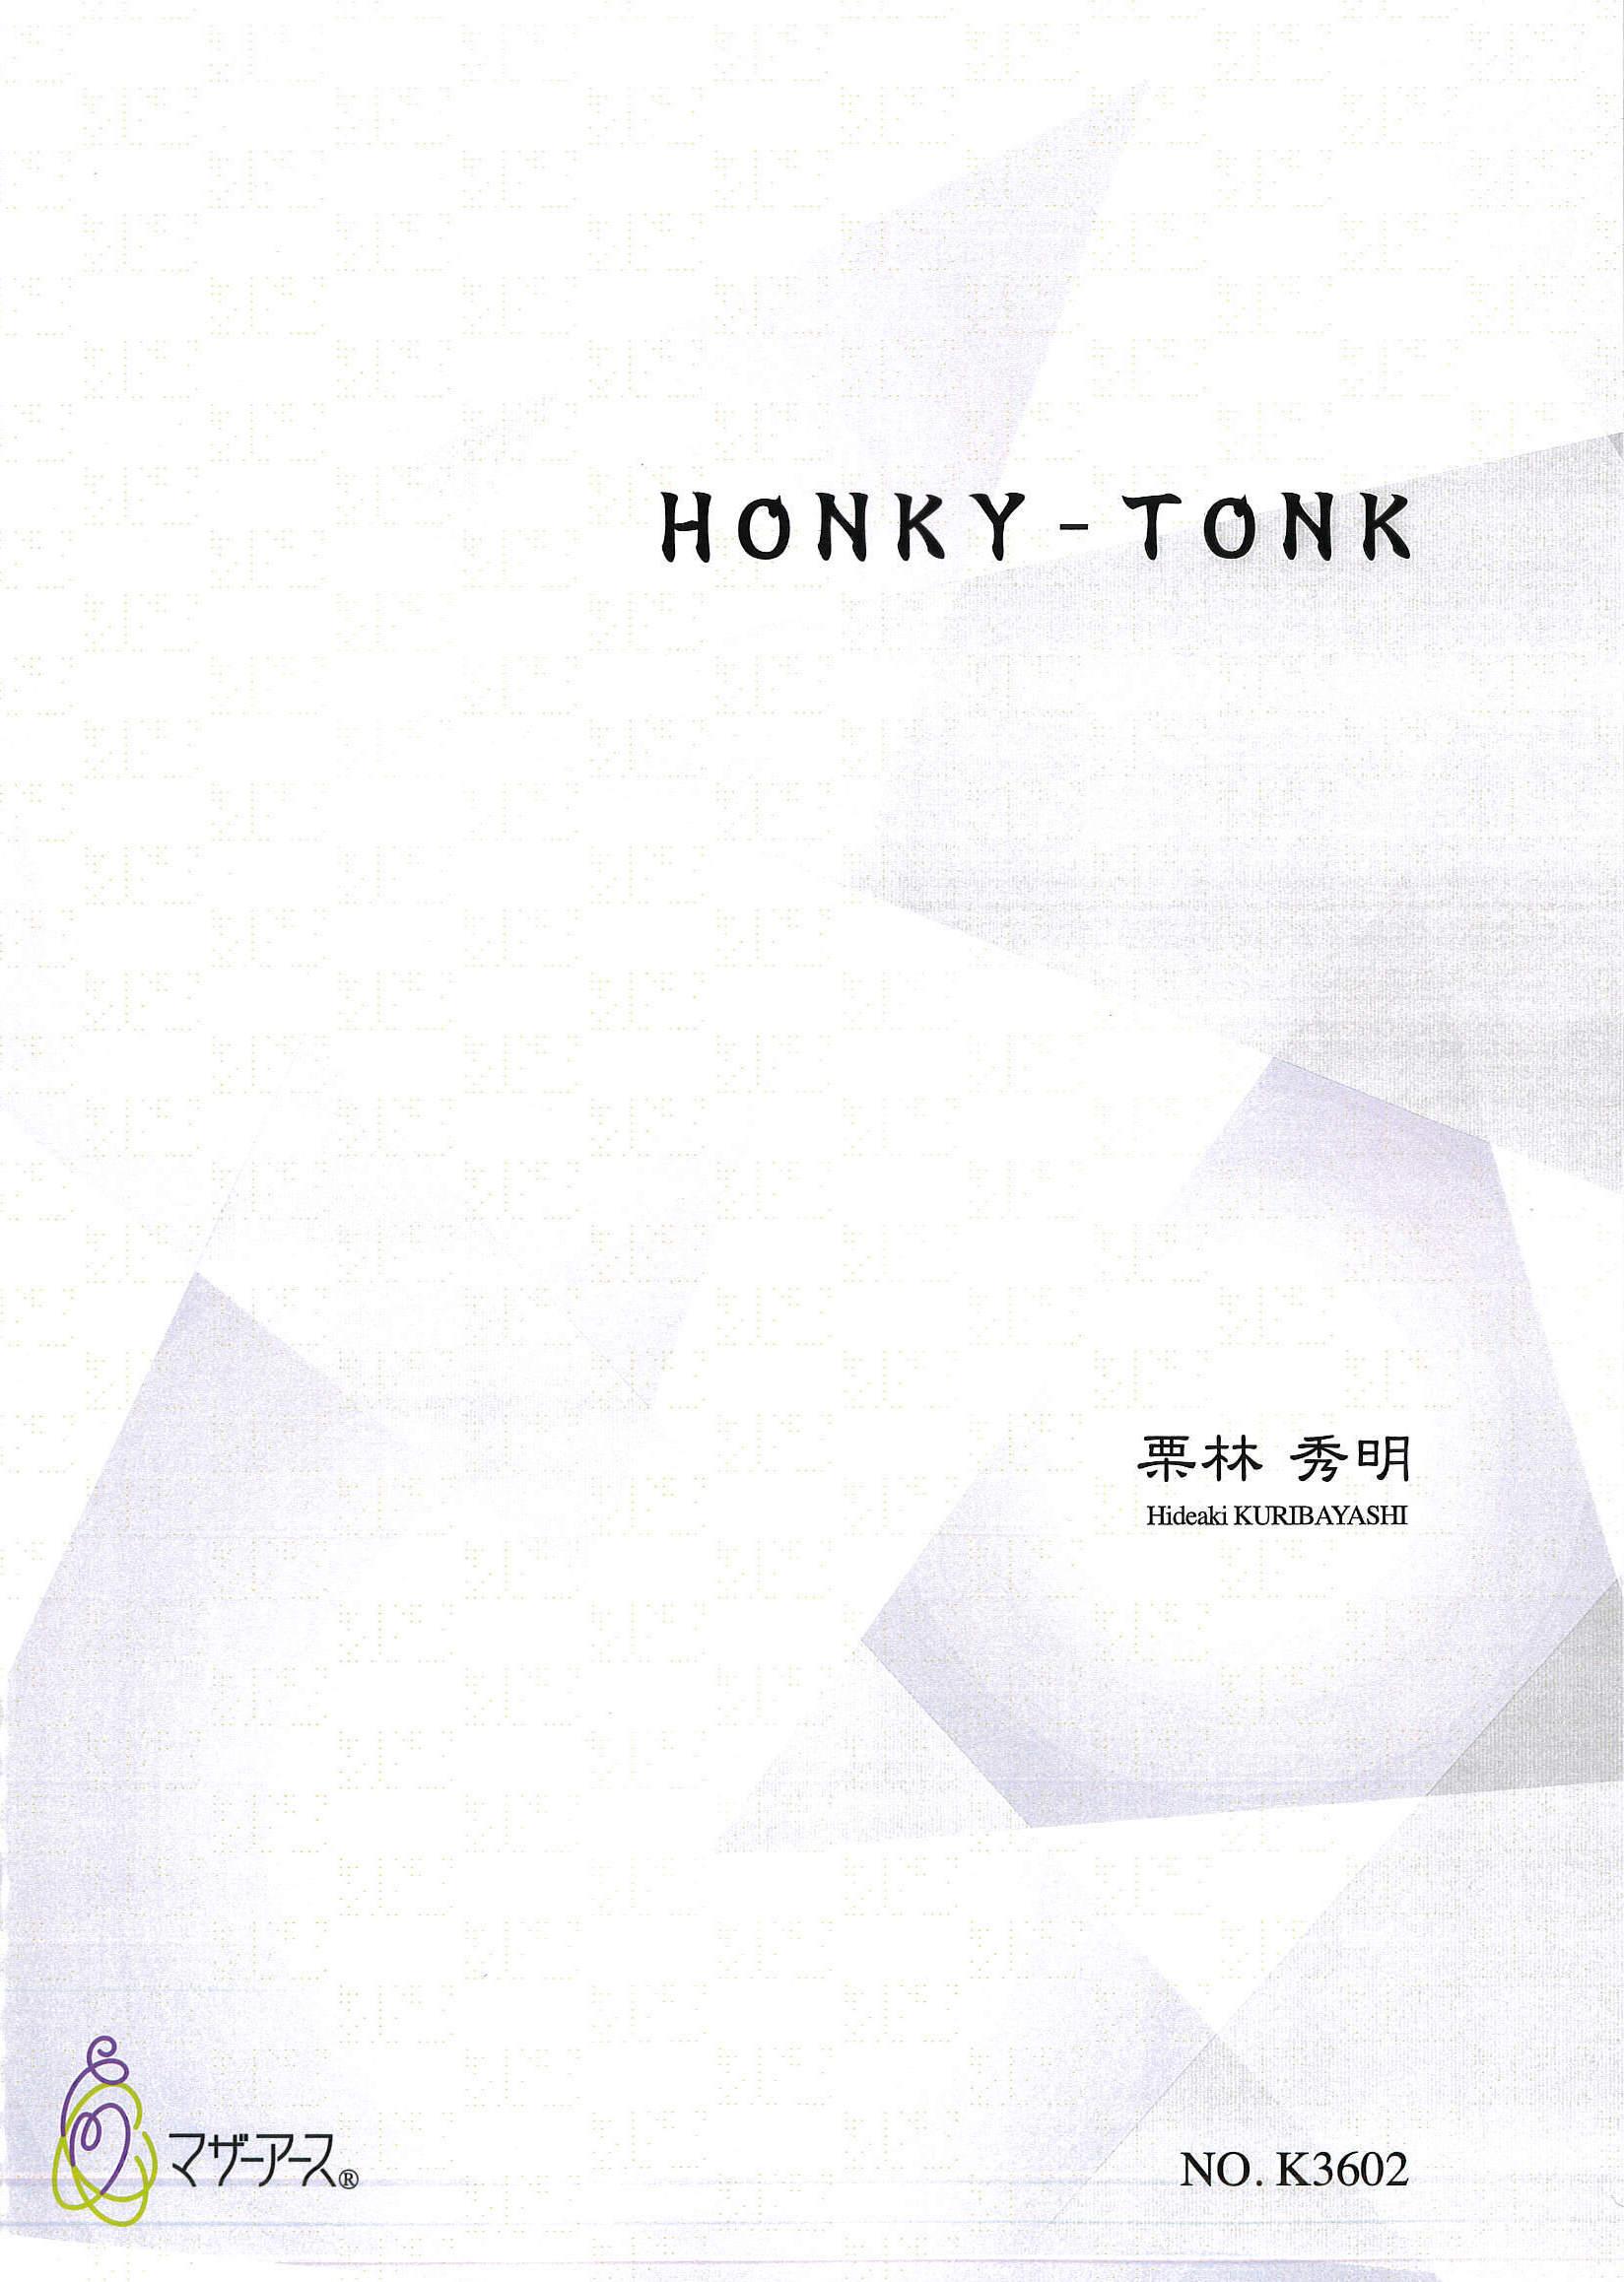 箏譜+五線譜 HONKY-TONK[5571]